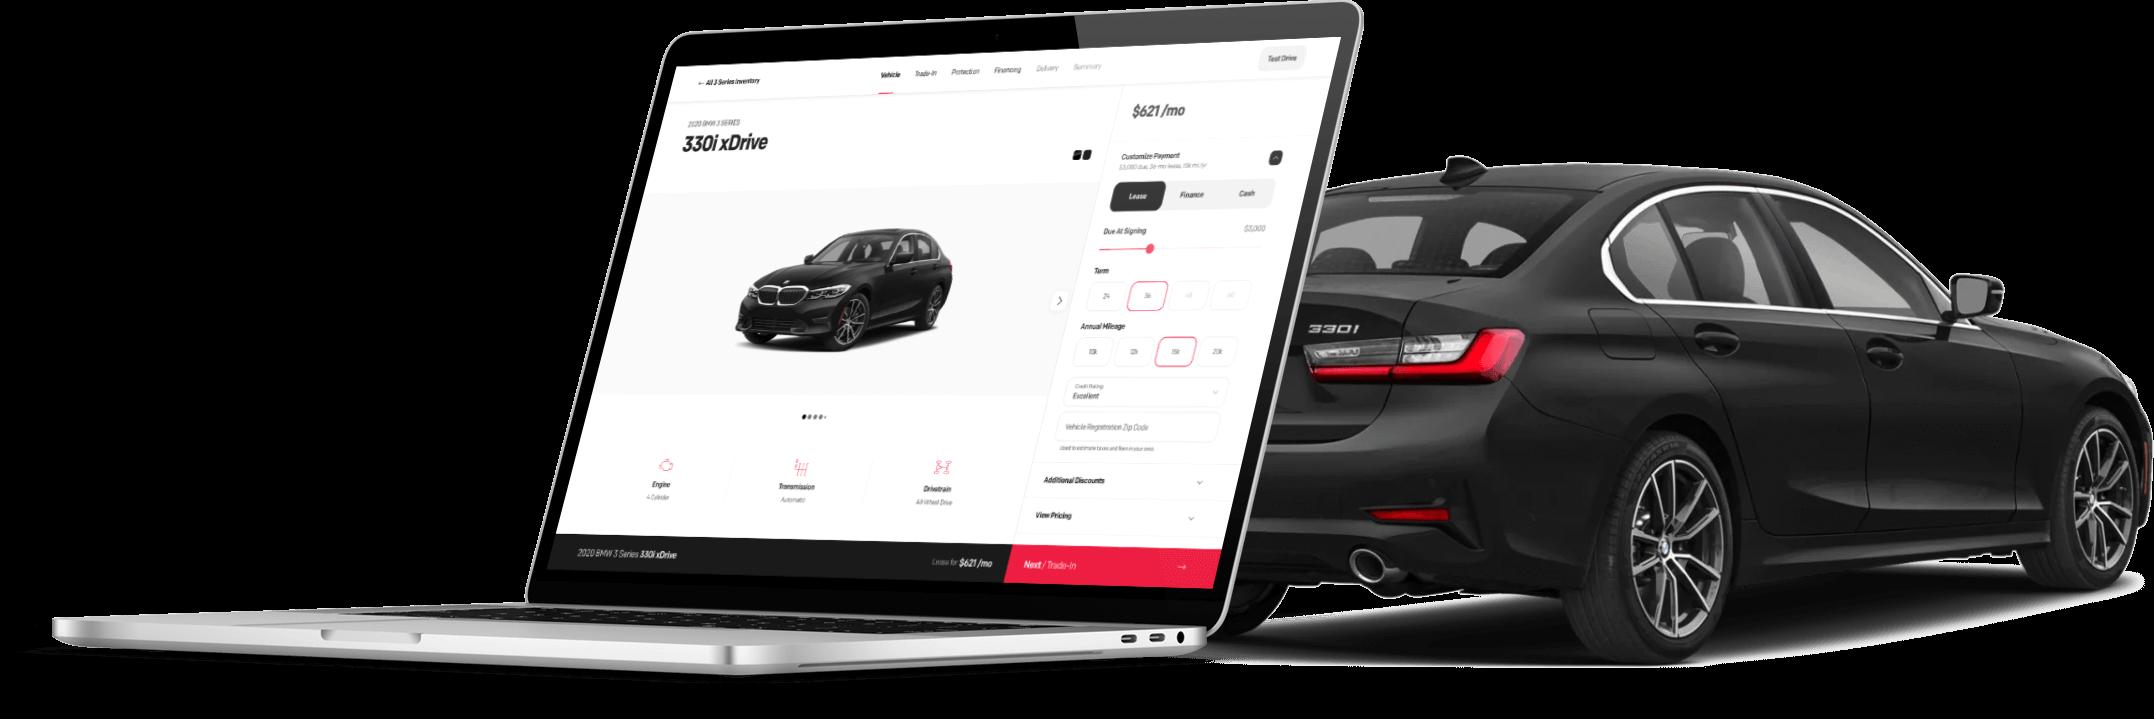 Digital Motors Vehicle Details